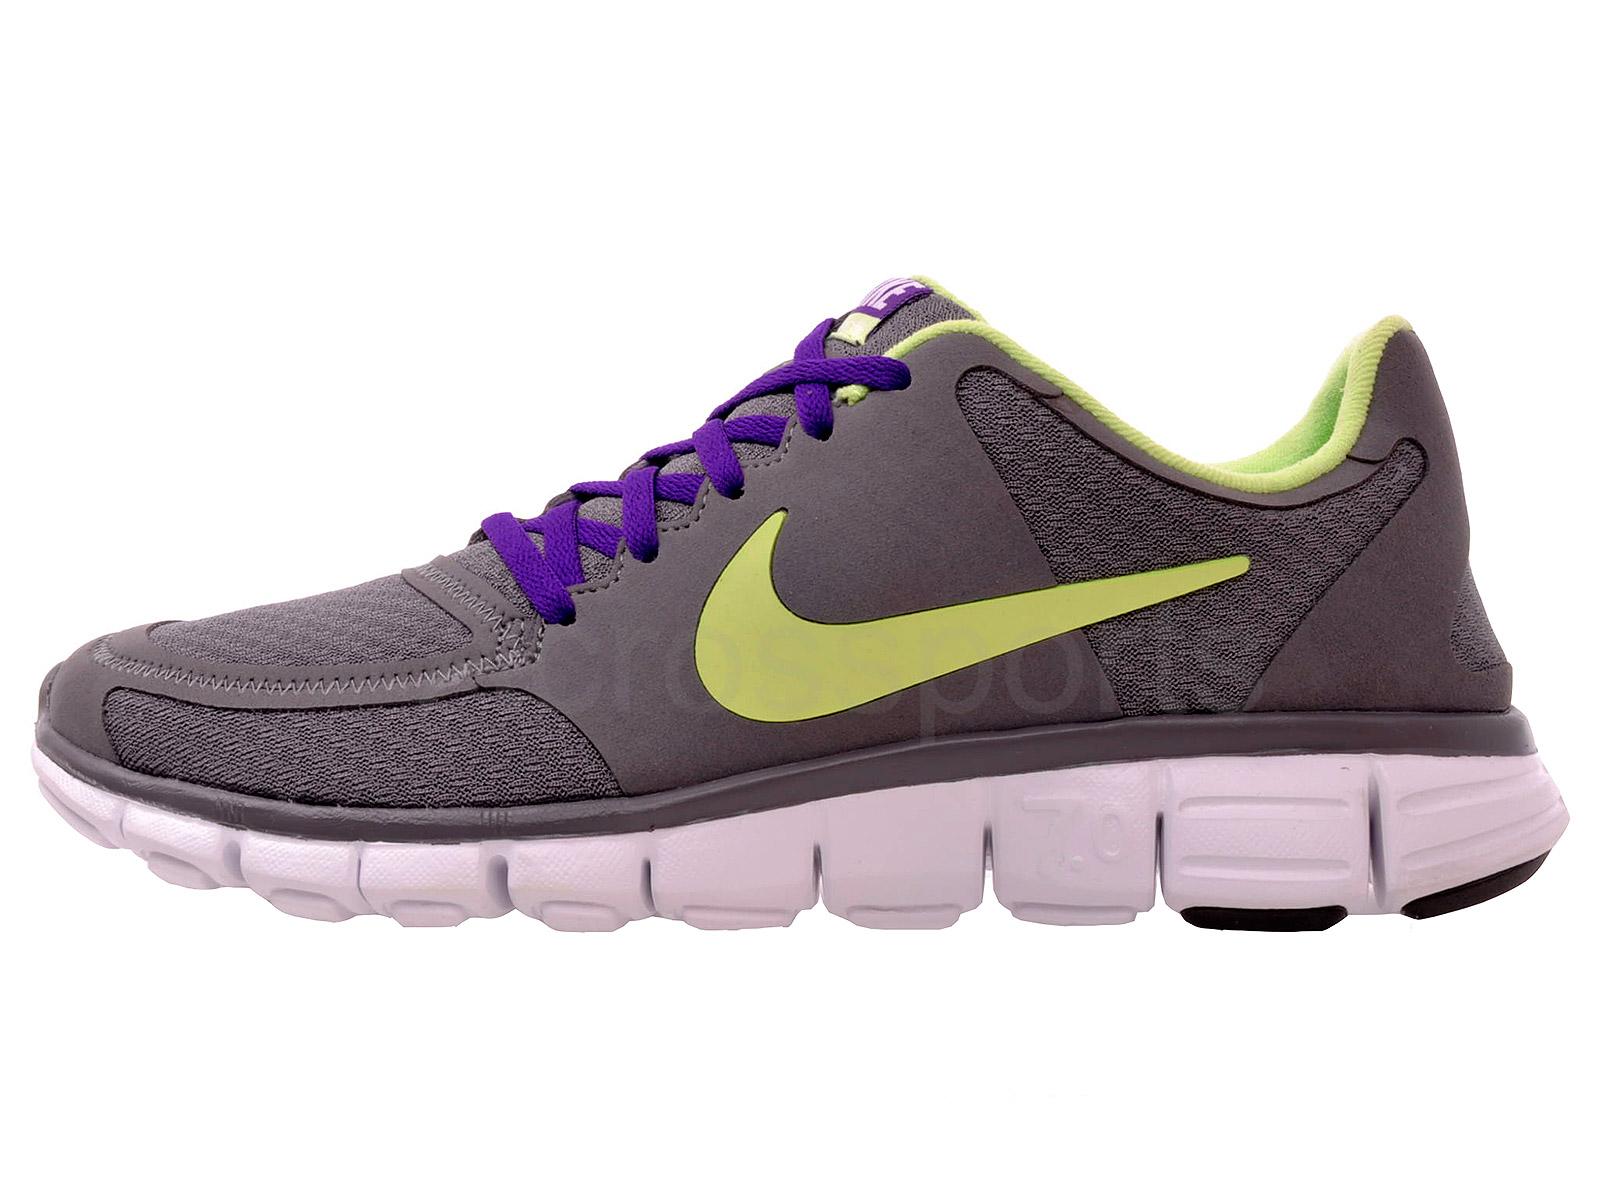 Nike Wmns Free 7.0 V2 2013 Womens Barefoot Run Running ...